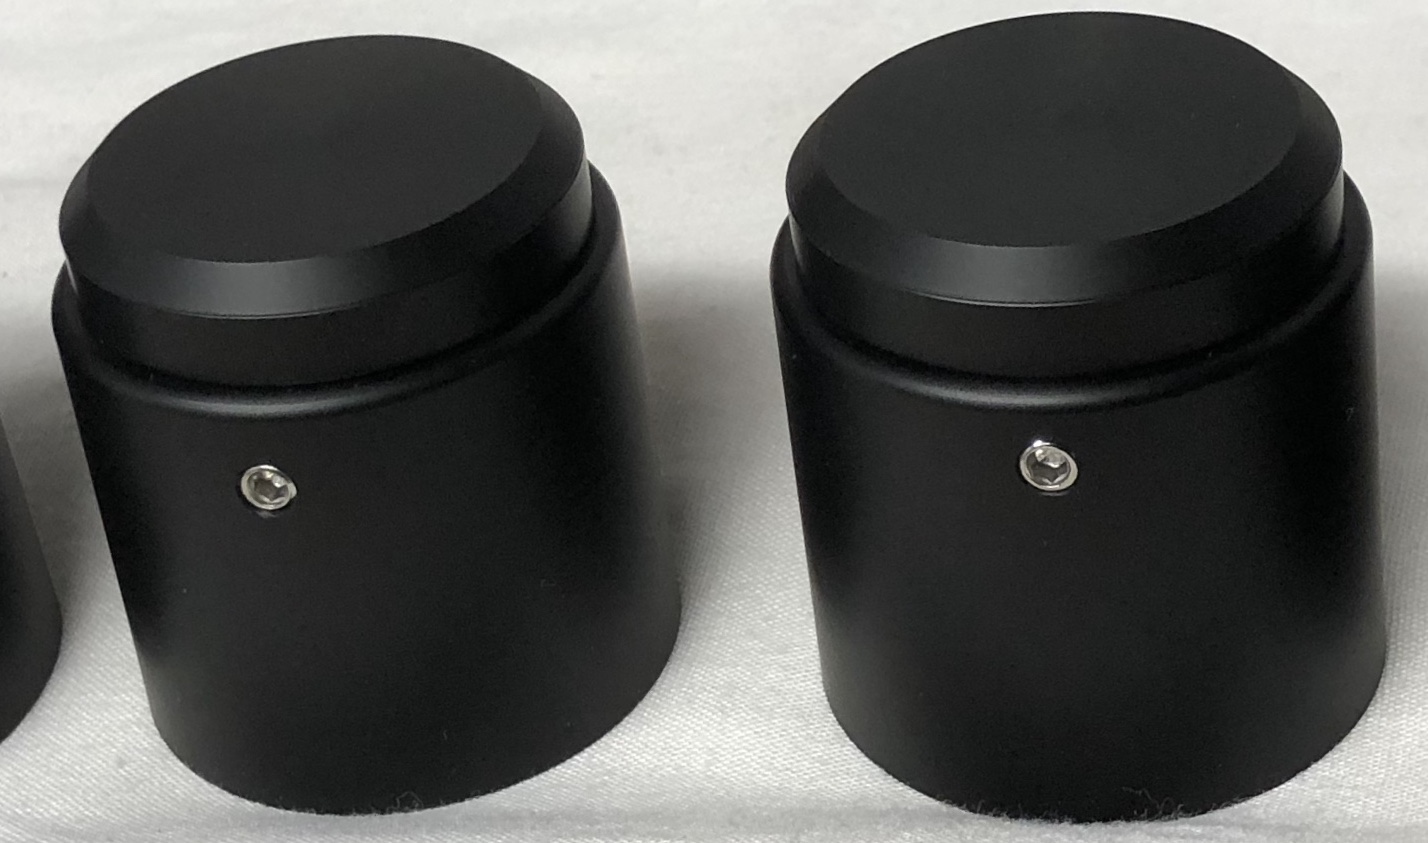 Axle Sliders for Honda Grom or Kawasaki Z125